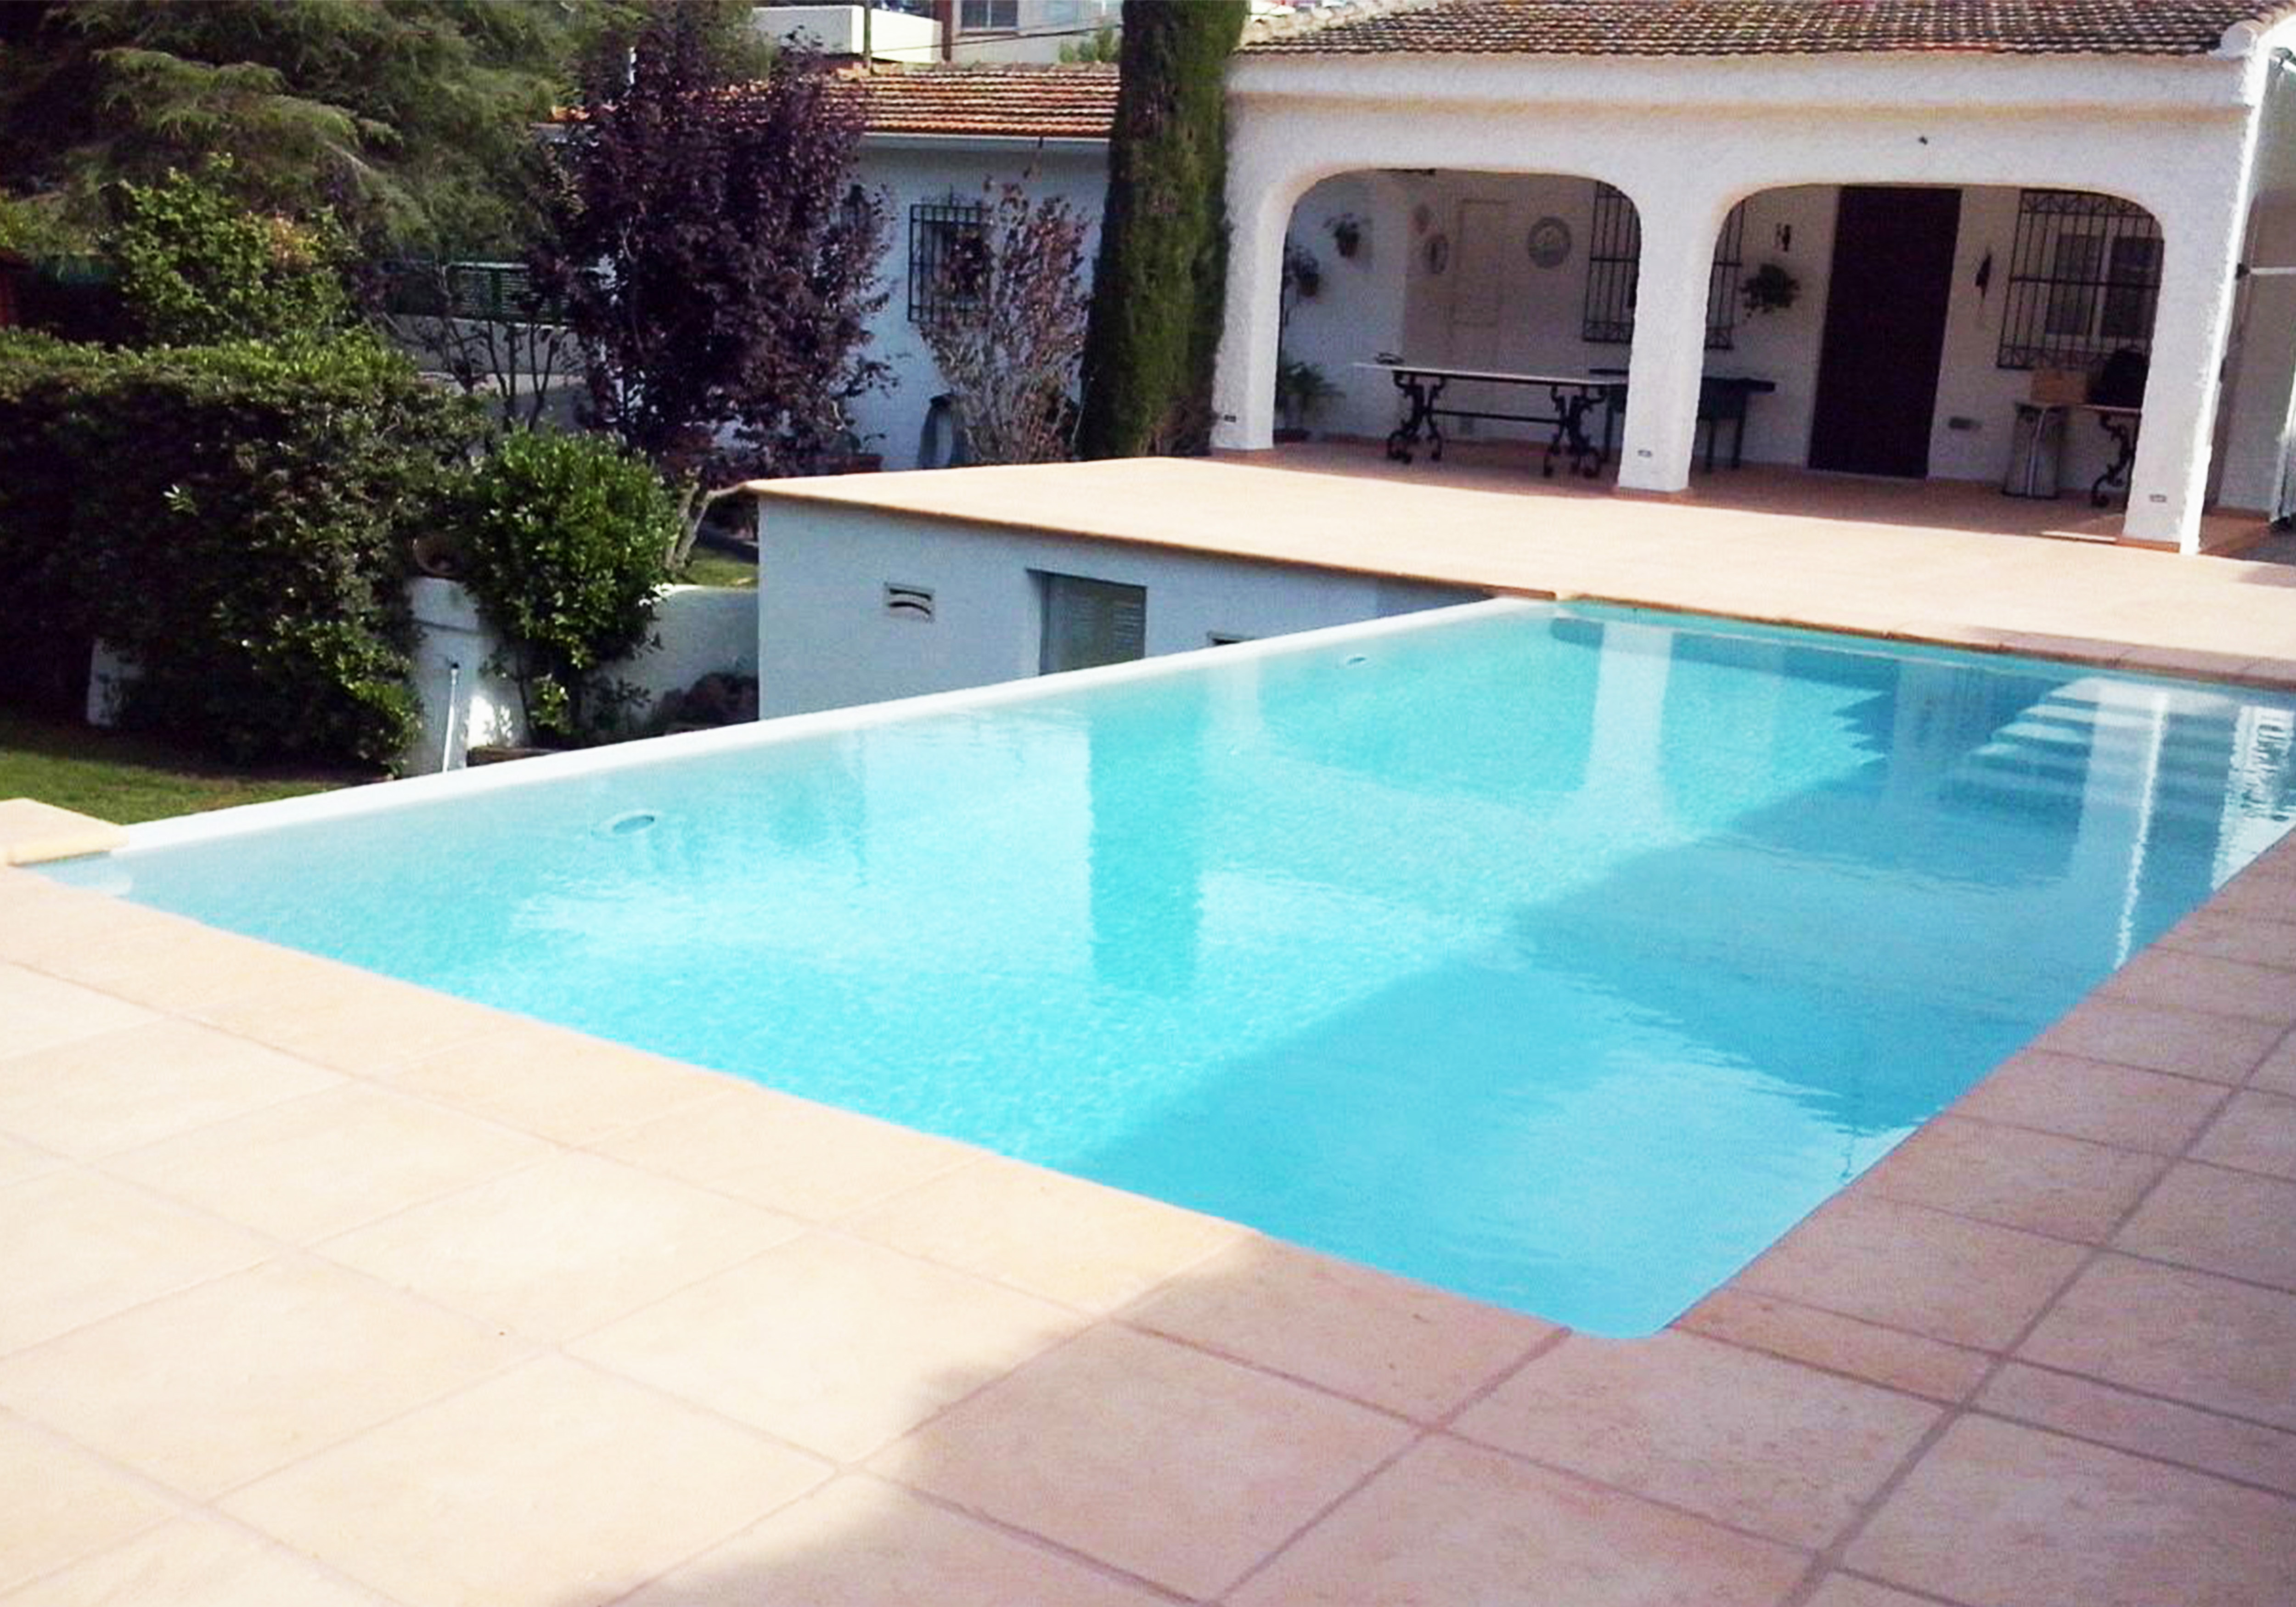 Piscinas desbordantes pisicilimp especialistas en piscinas for Formas para piscinas